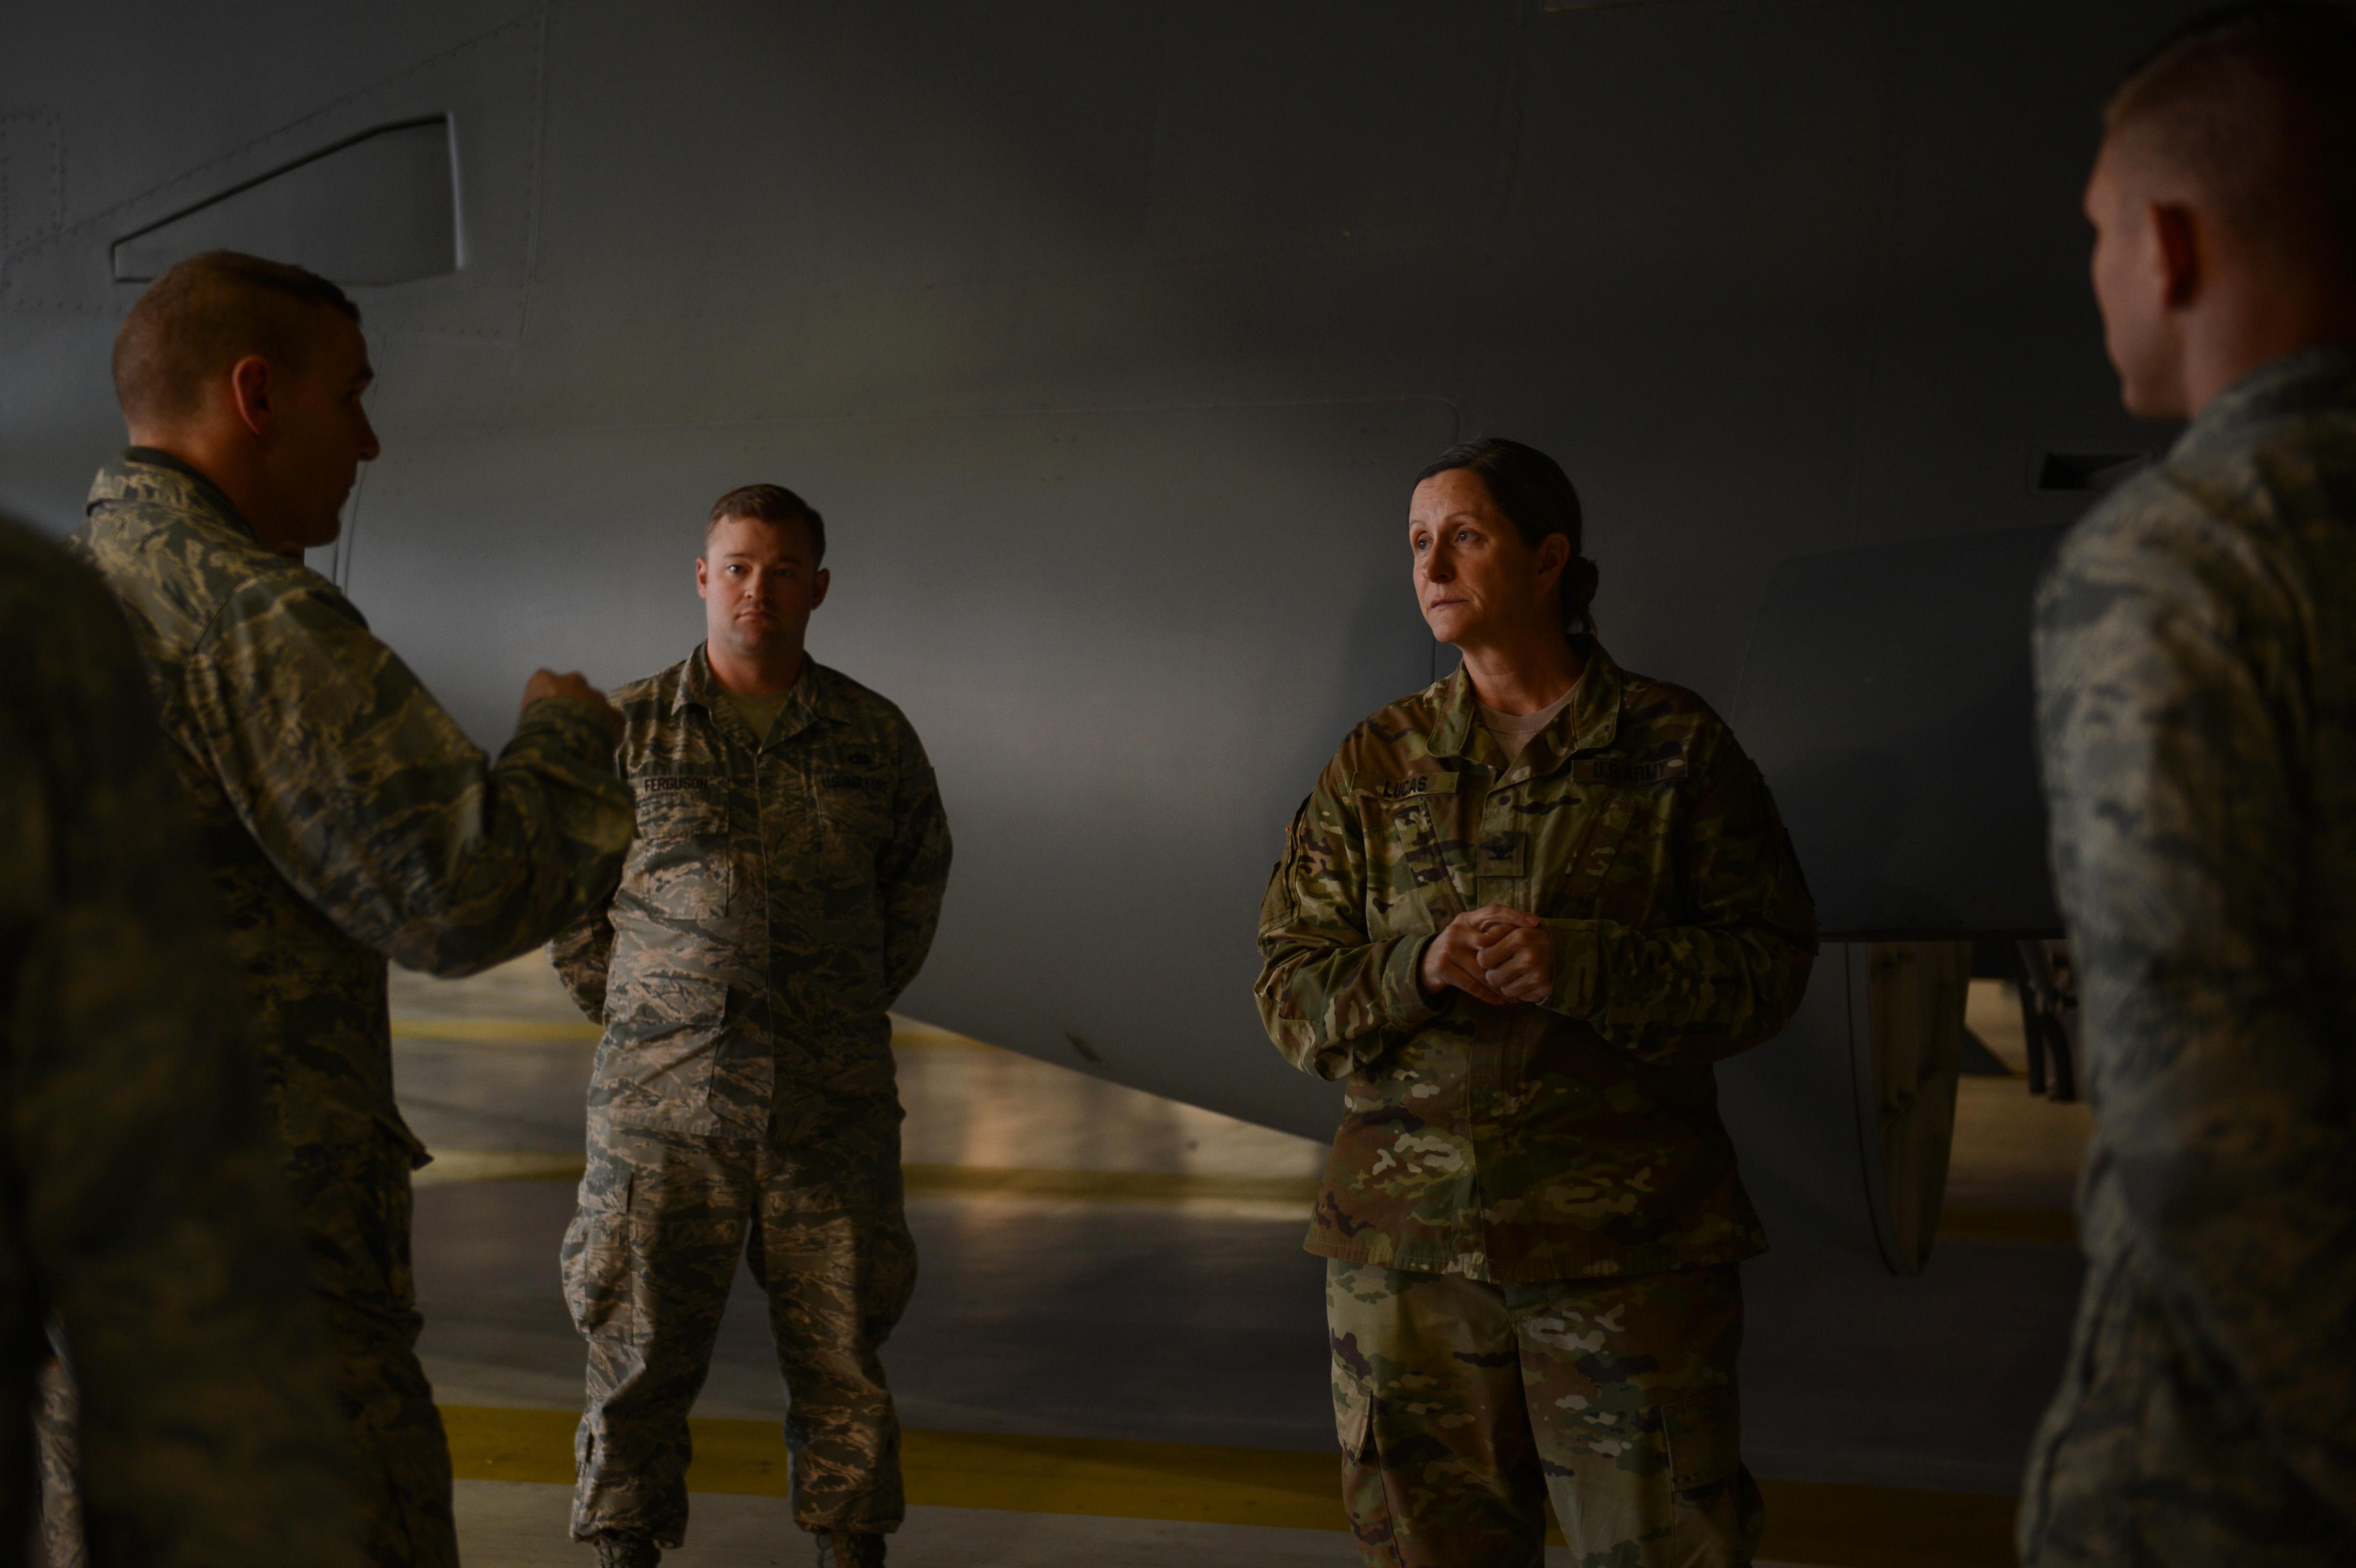 833rd aero squadron - Joint Base Garrison Commander Receives Immersion Tour